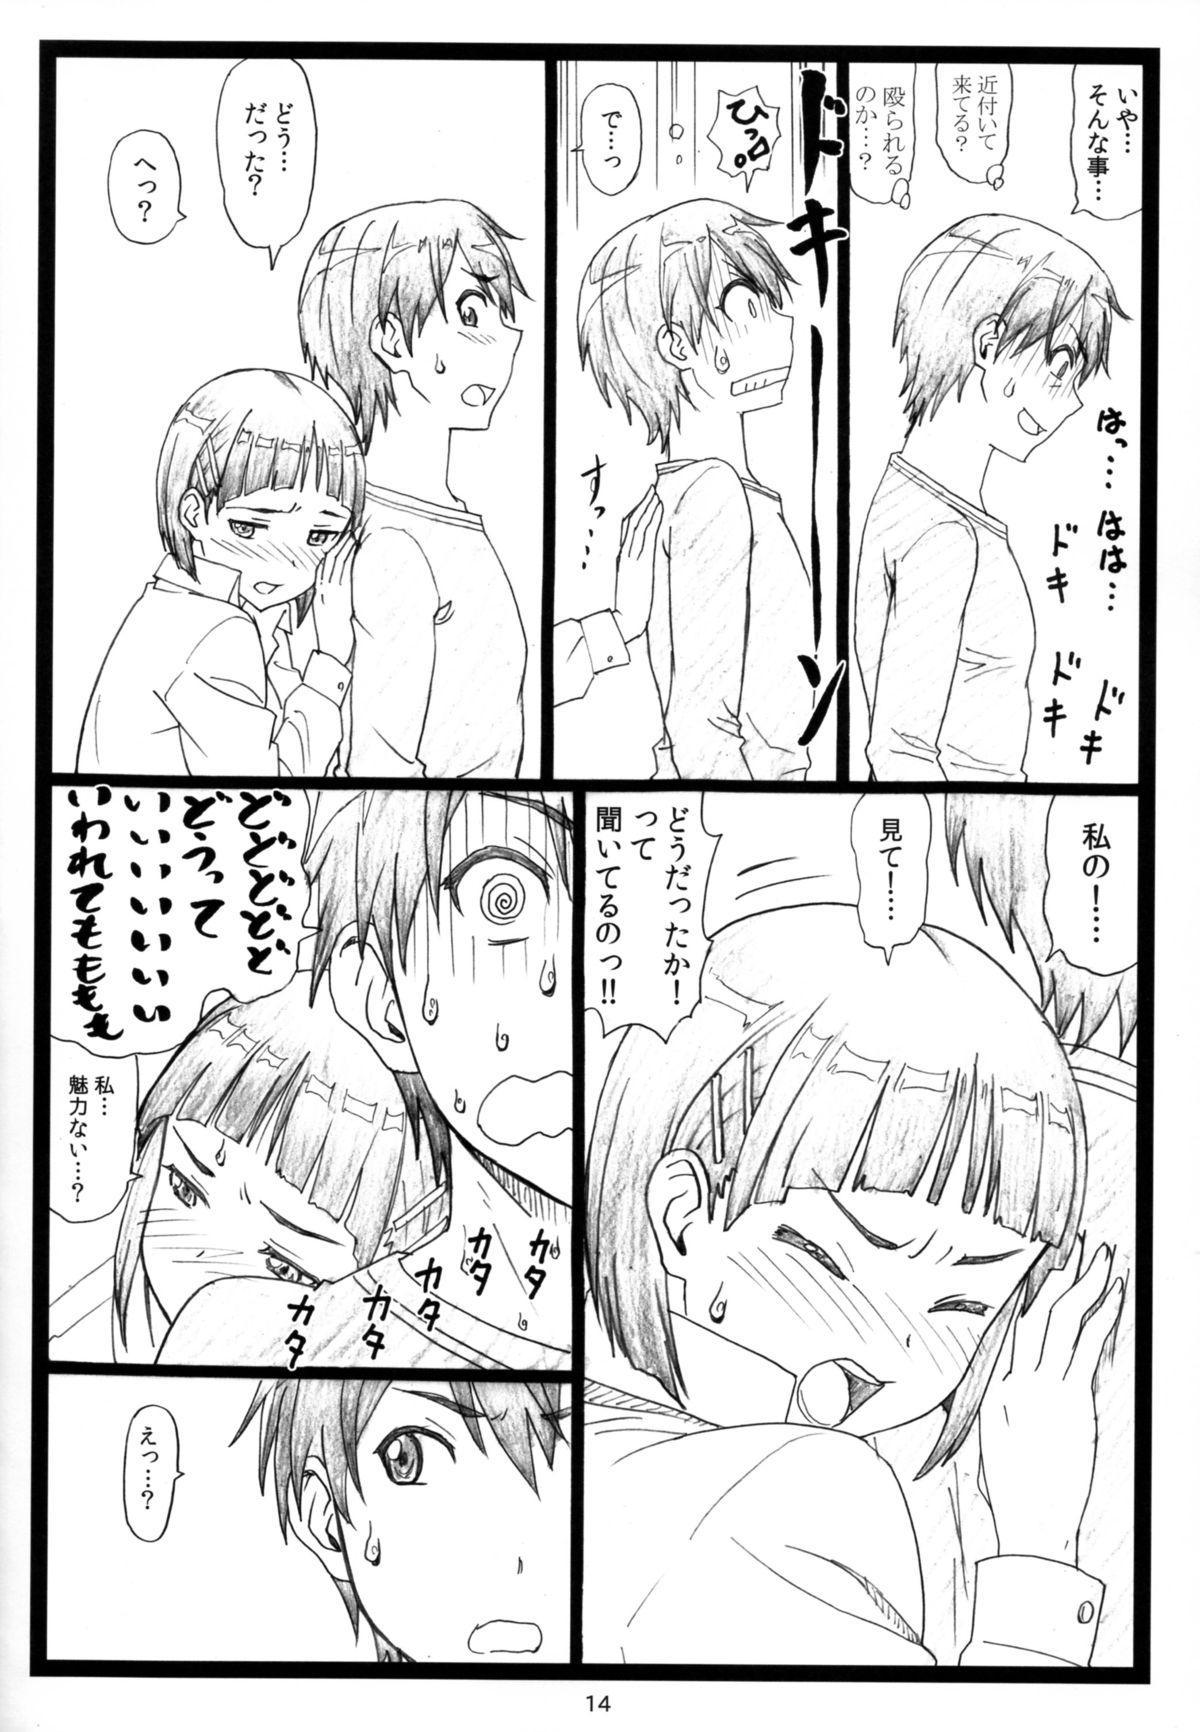 Kuzuha 13